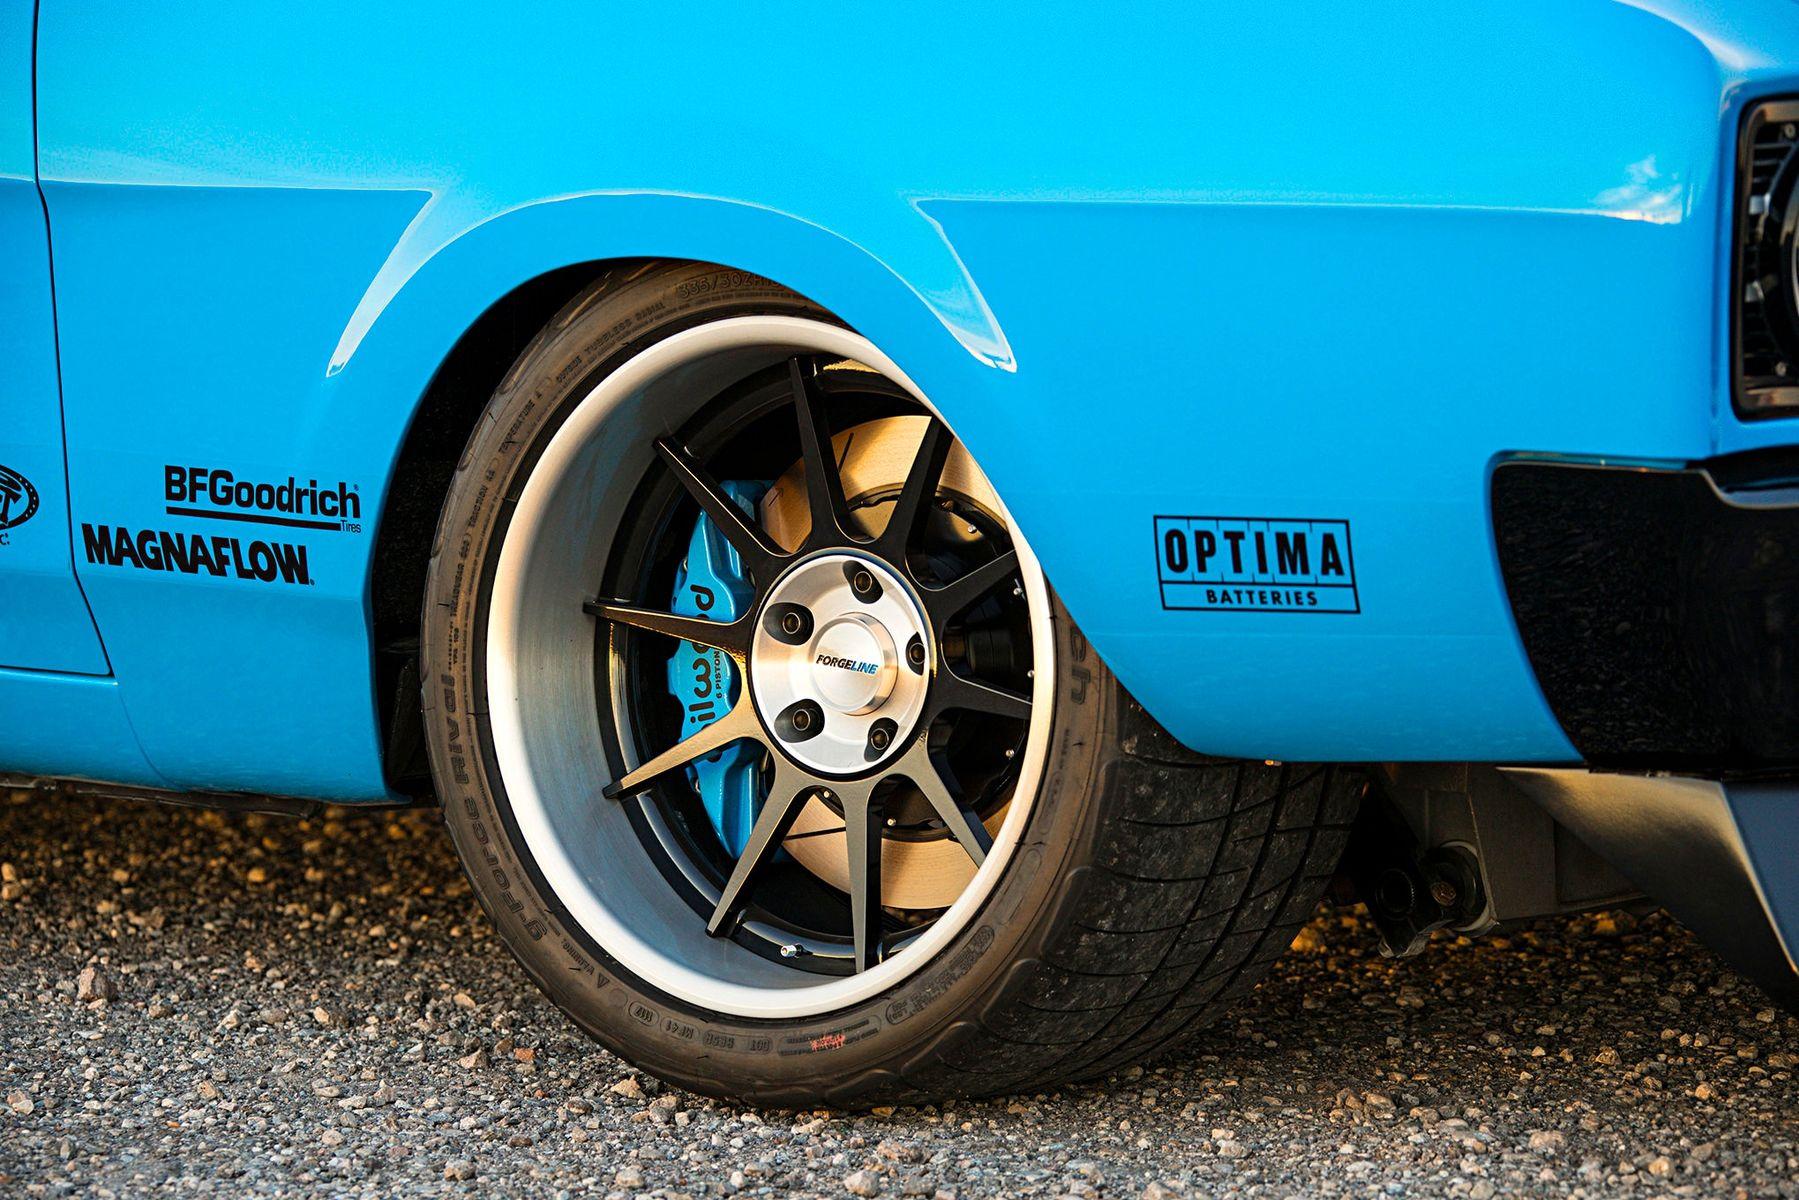 1969 Mercury  | Jim McIlvaine's Pro-Touring Mercury Cyclone on Forgeline Rebel Wheels